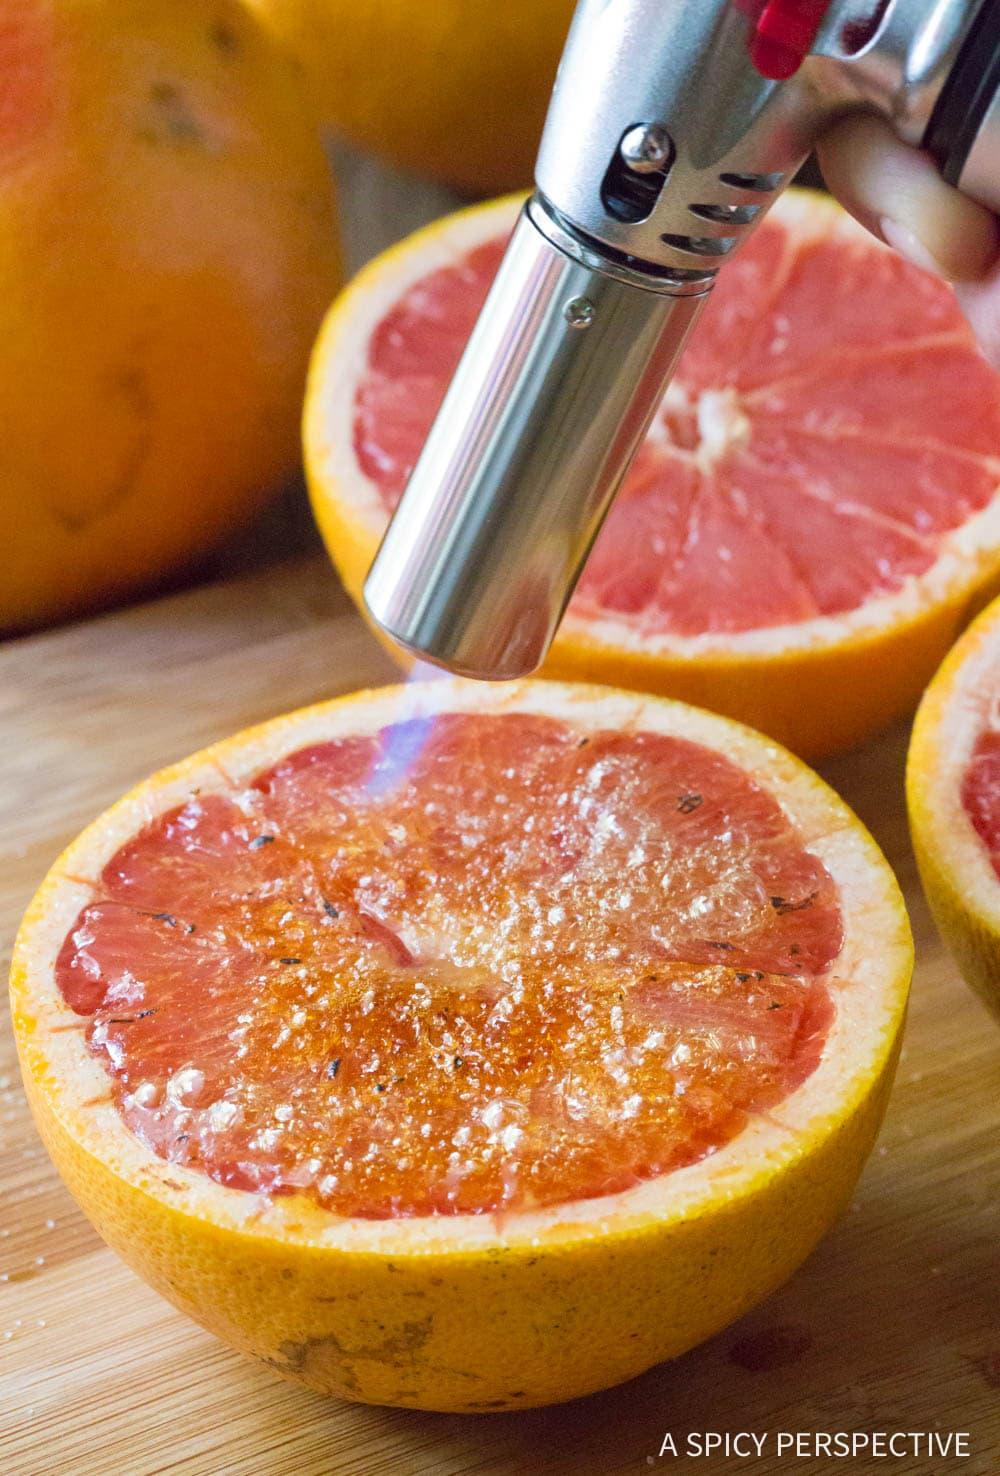 Torch: Bruleed Grapefruit (Pamplemousse Brûlé) Recipe #ASpicyPerspective #vegan #vegetarian #healthy